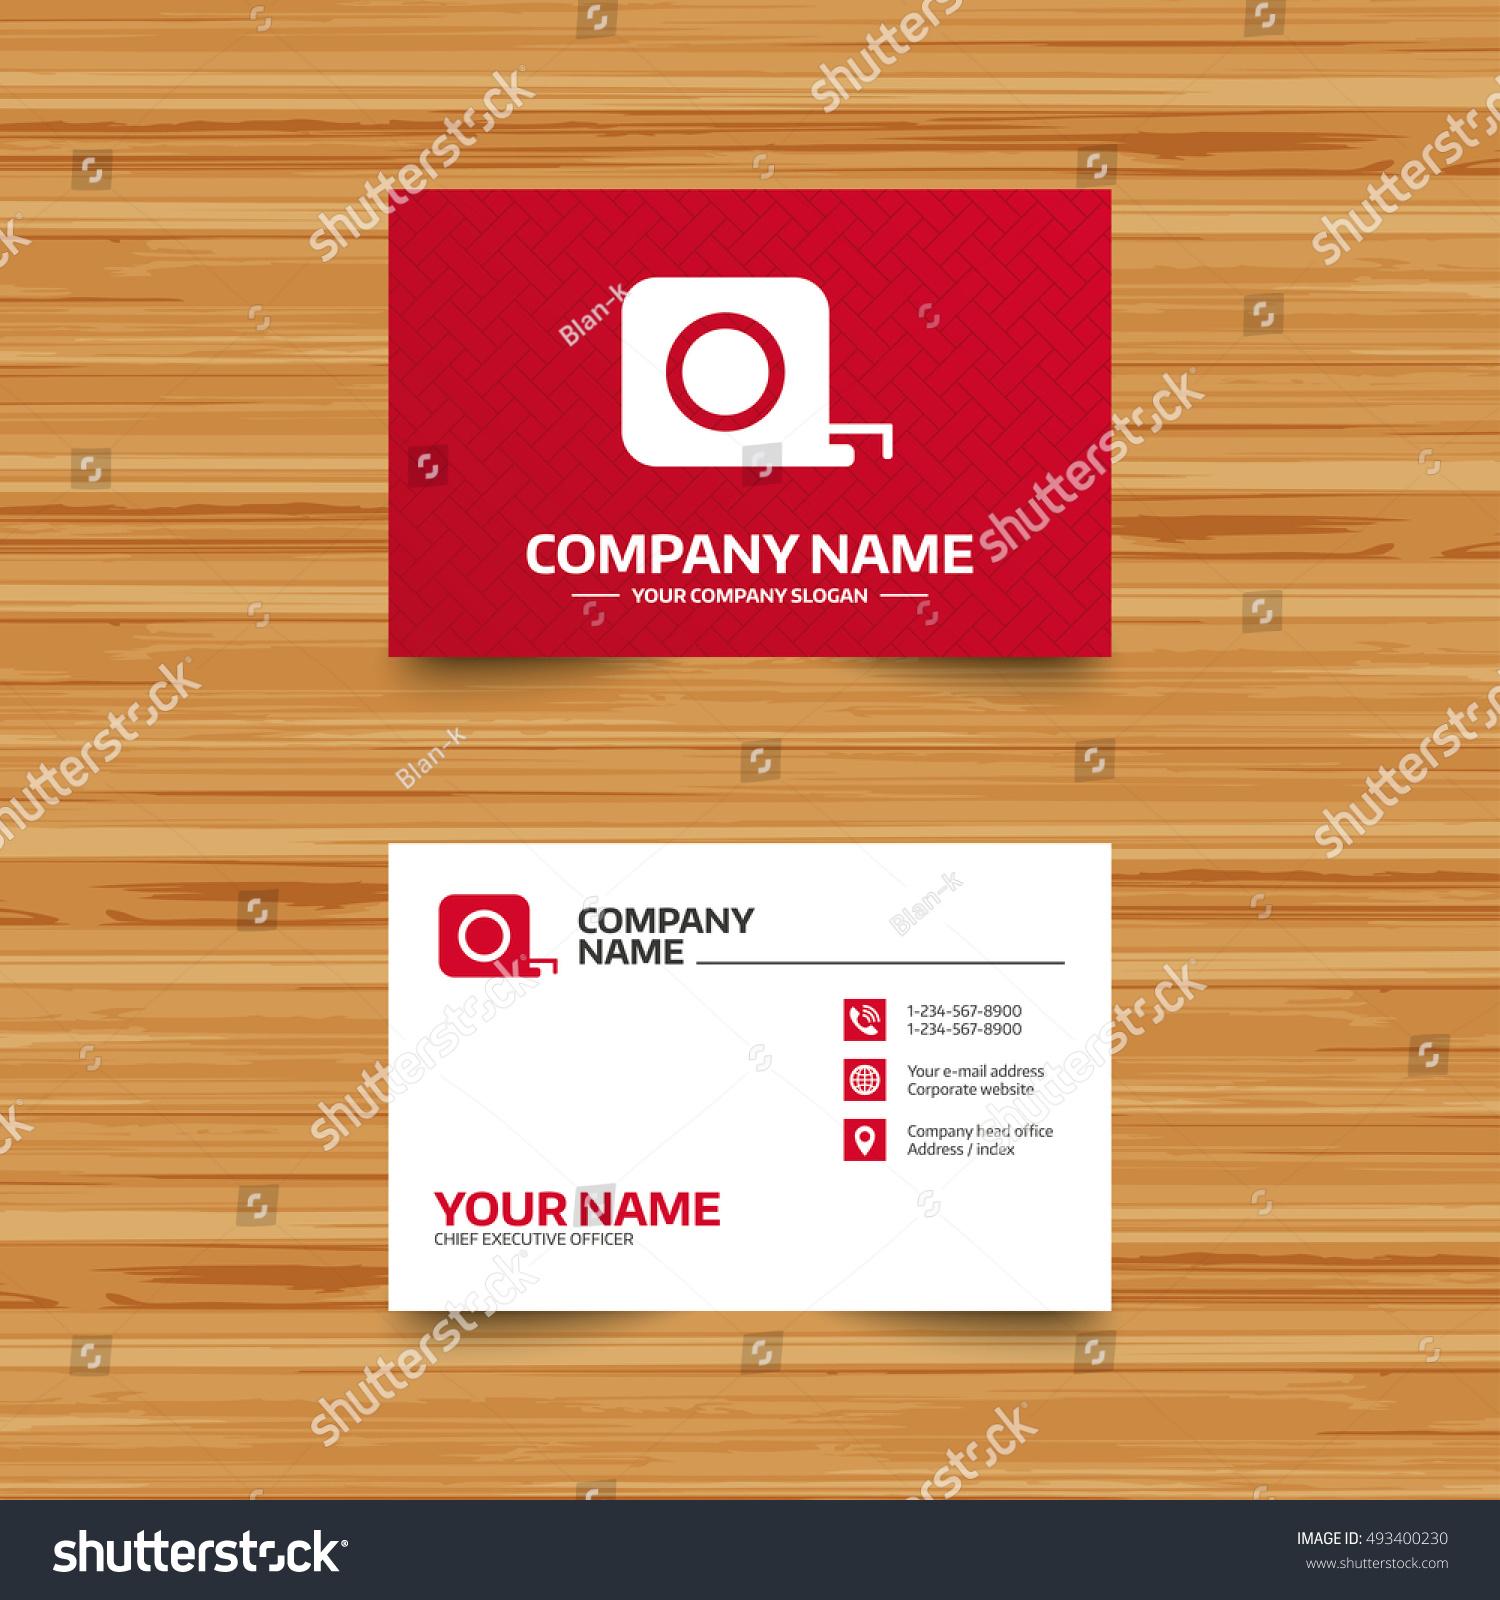 Business Card Template Roulette Construction Sign Stock Vector - Construction business card templates